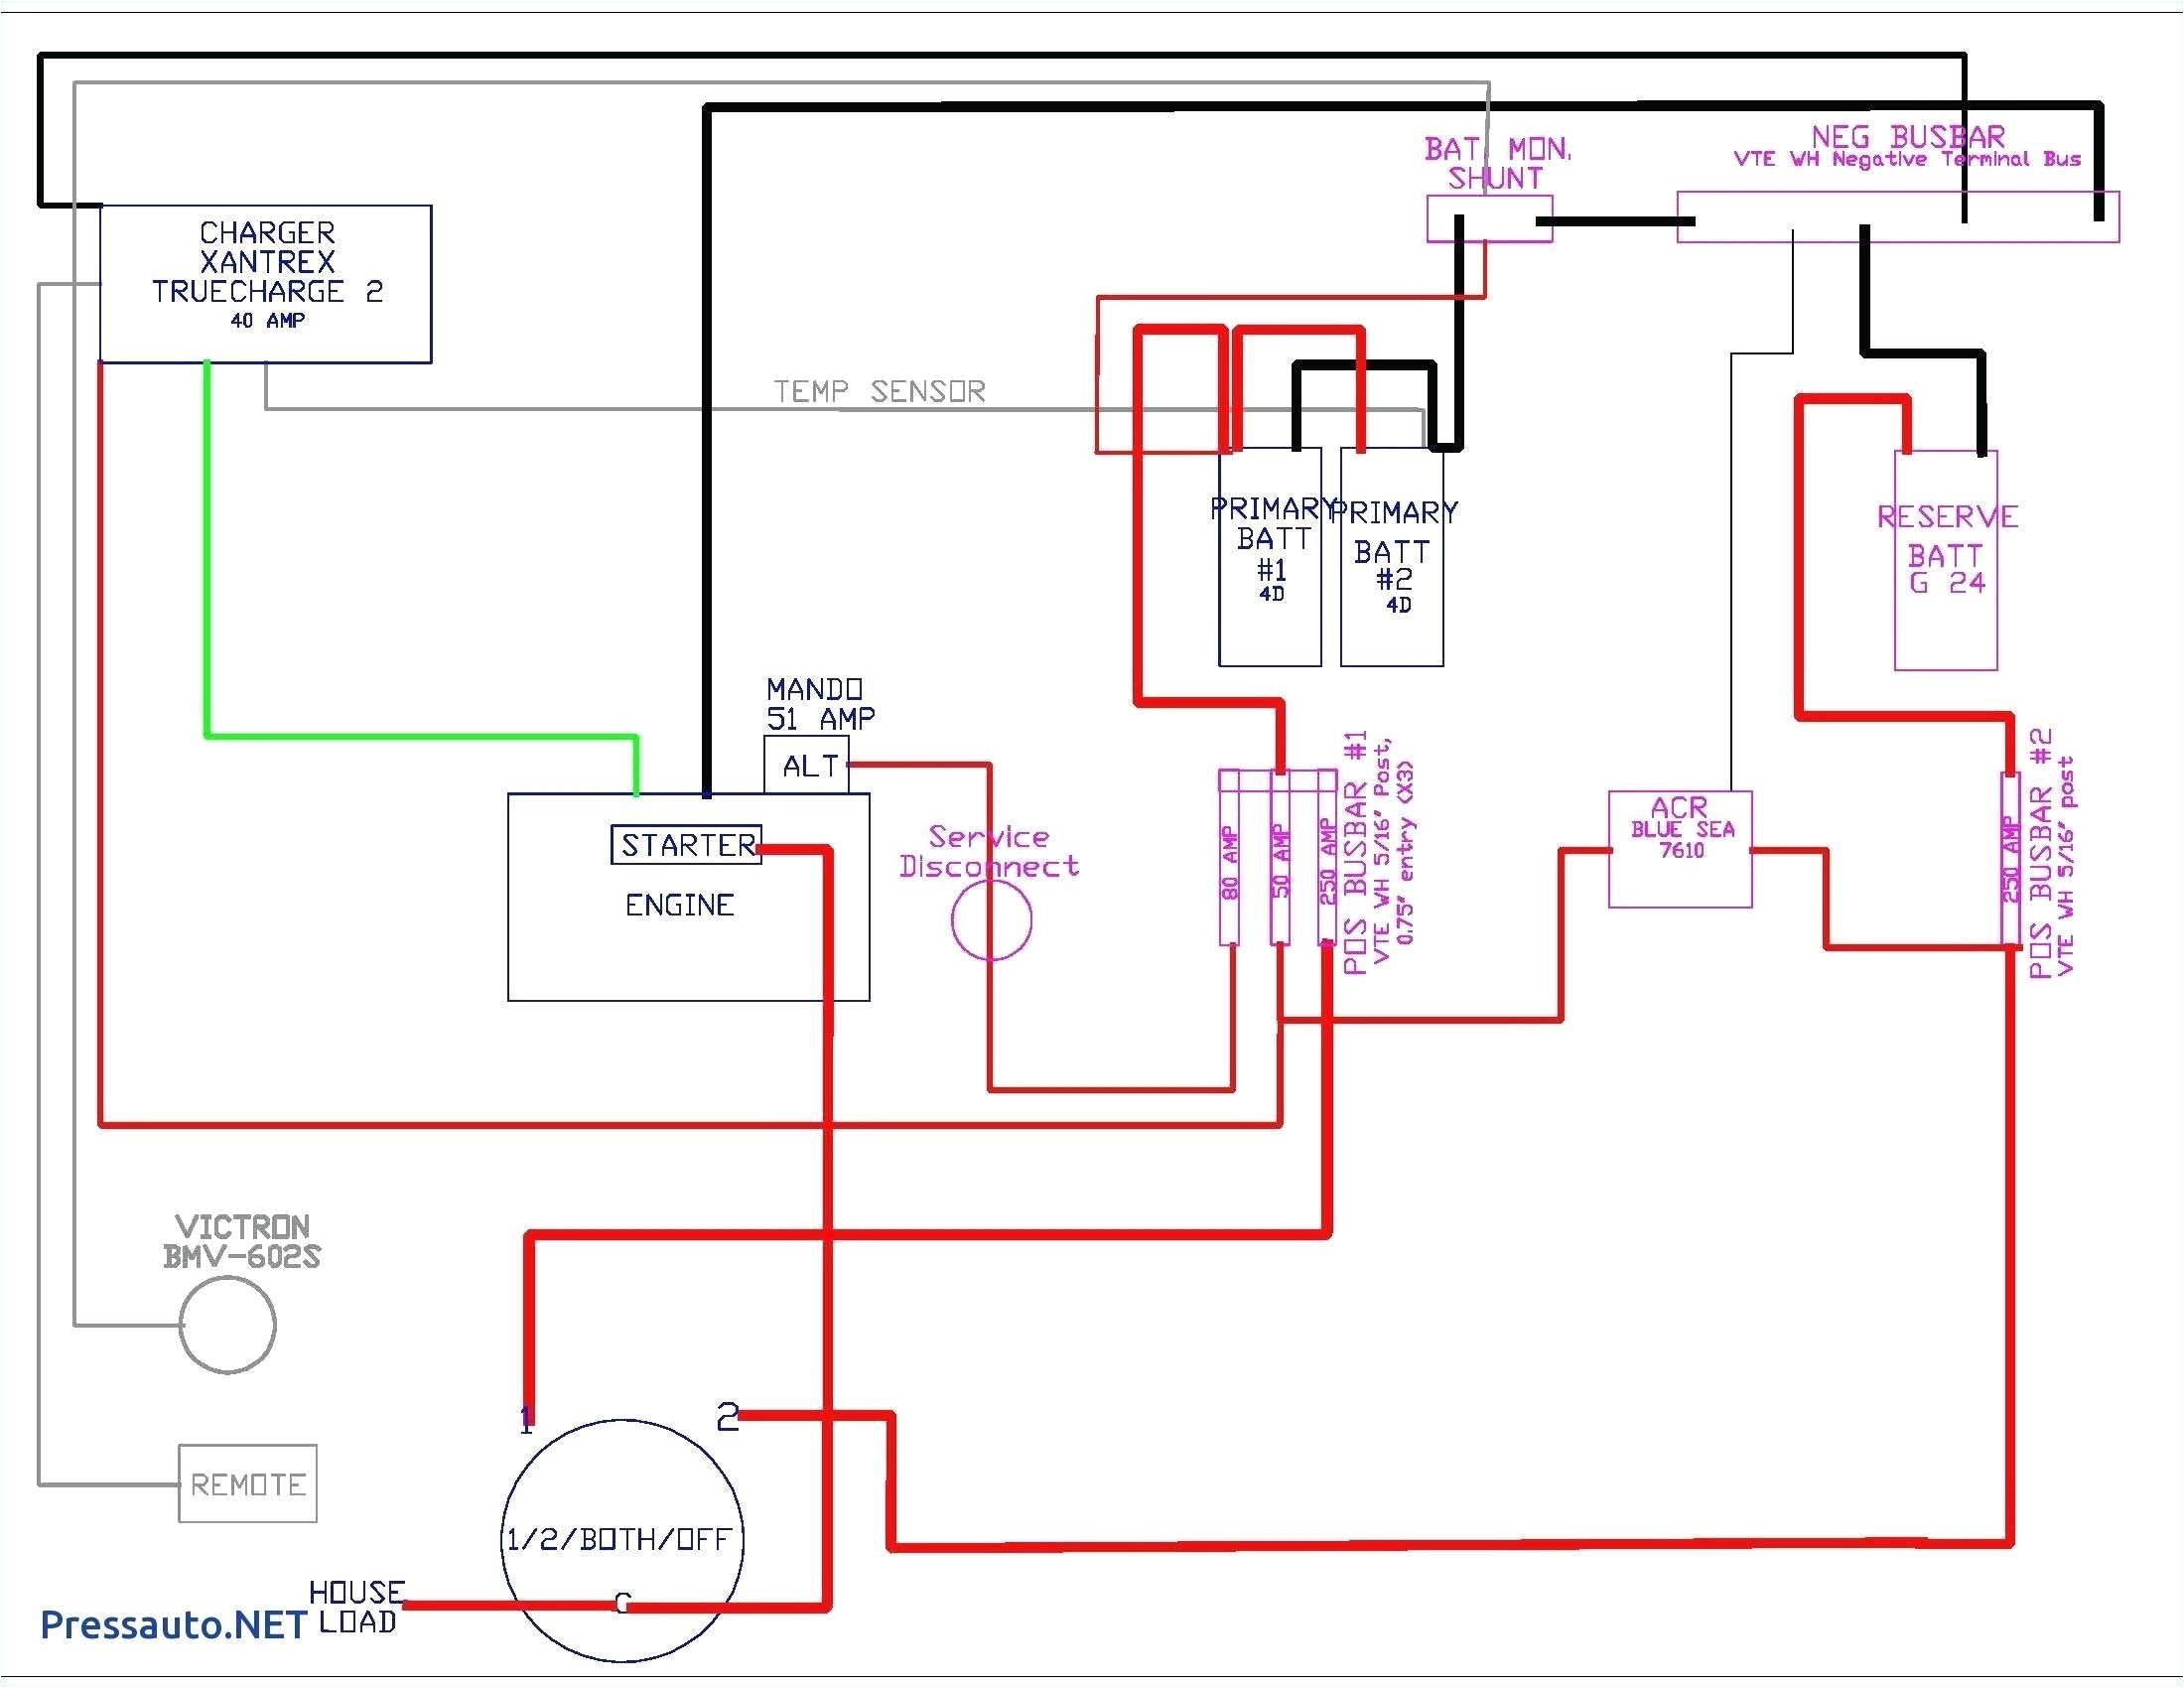 home wiring diagrams pdf wiring diagram toolbox wiring diagram pdf residential electrical wiring codes wiring diagram